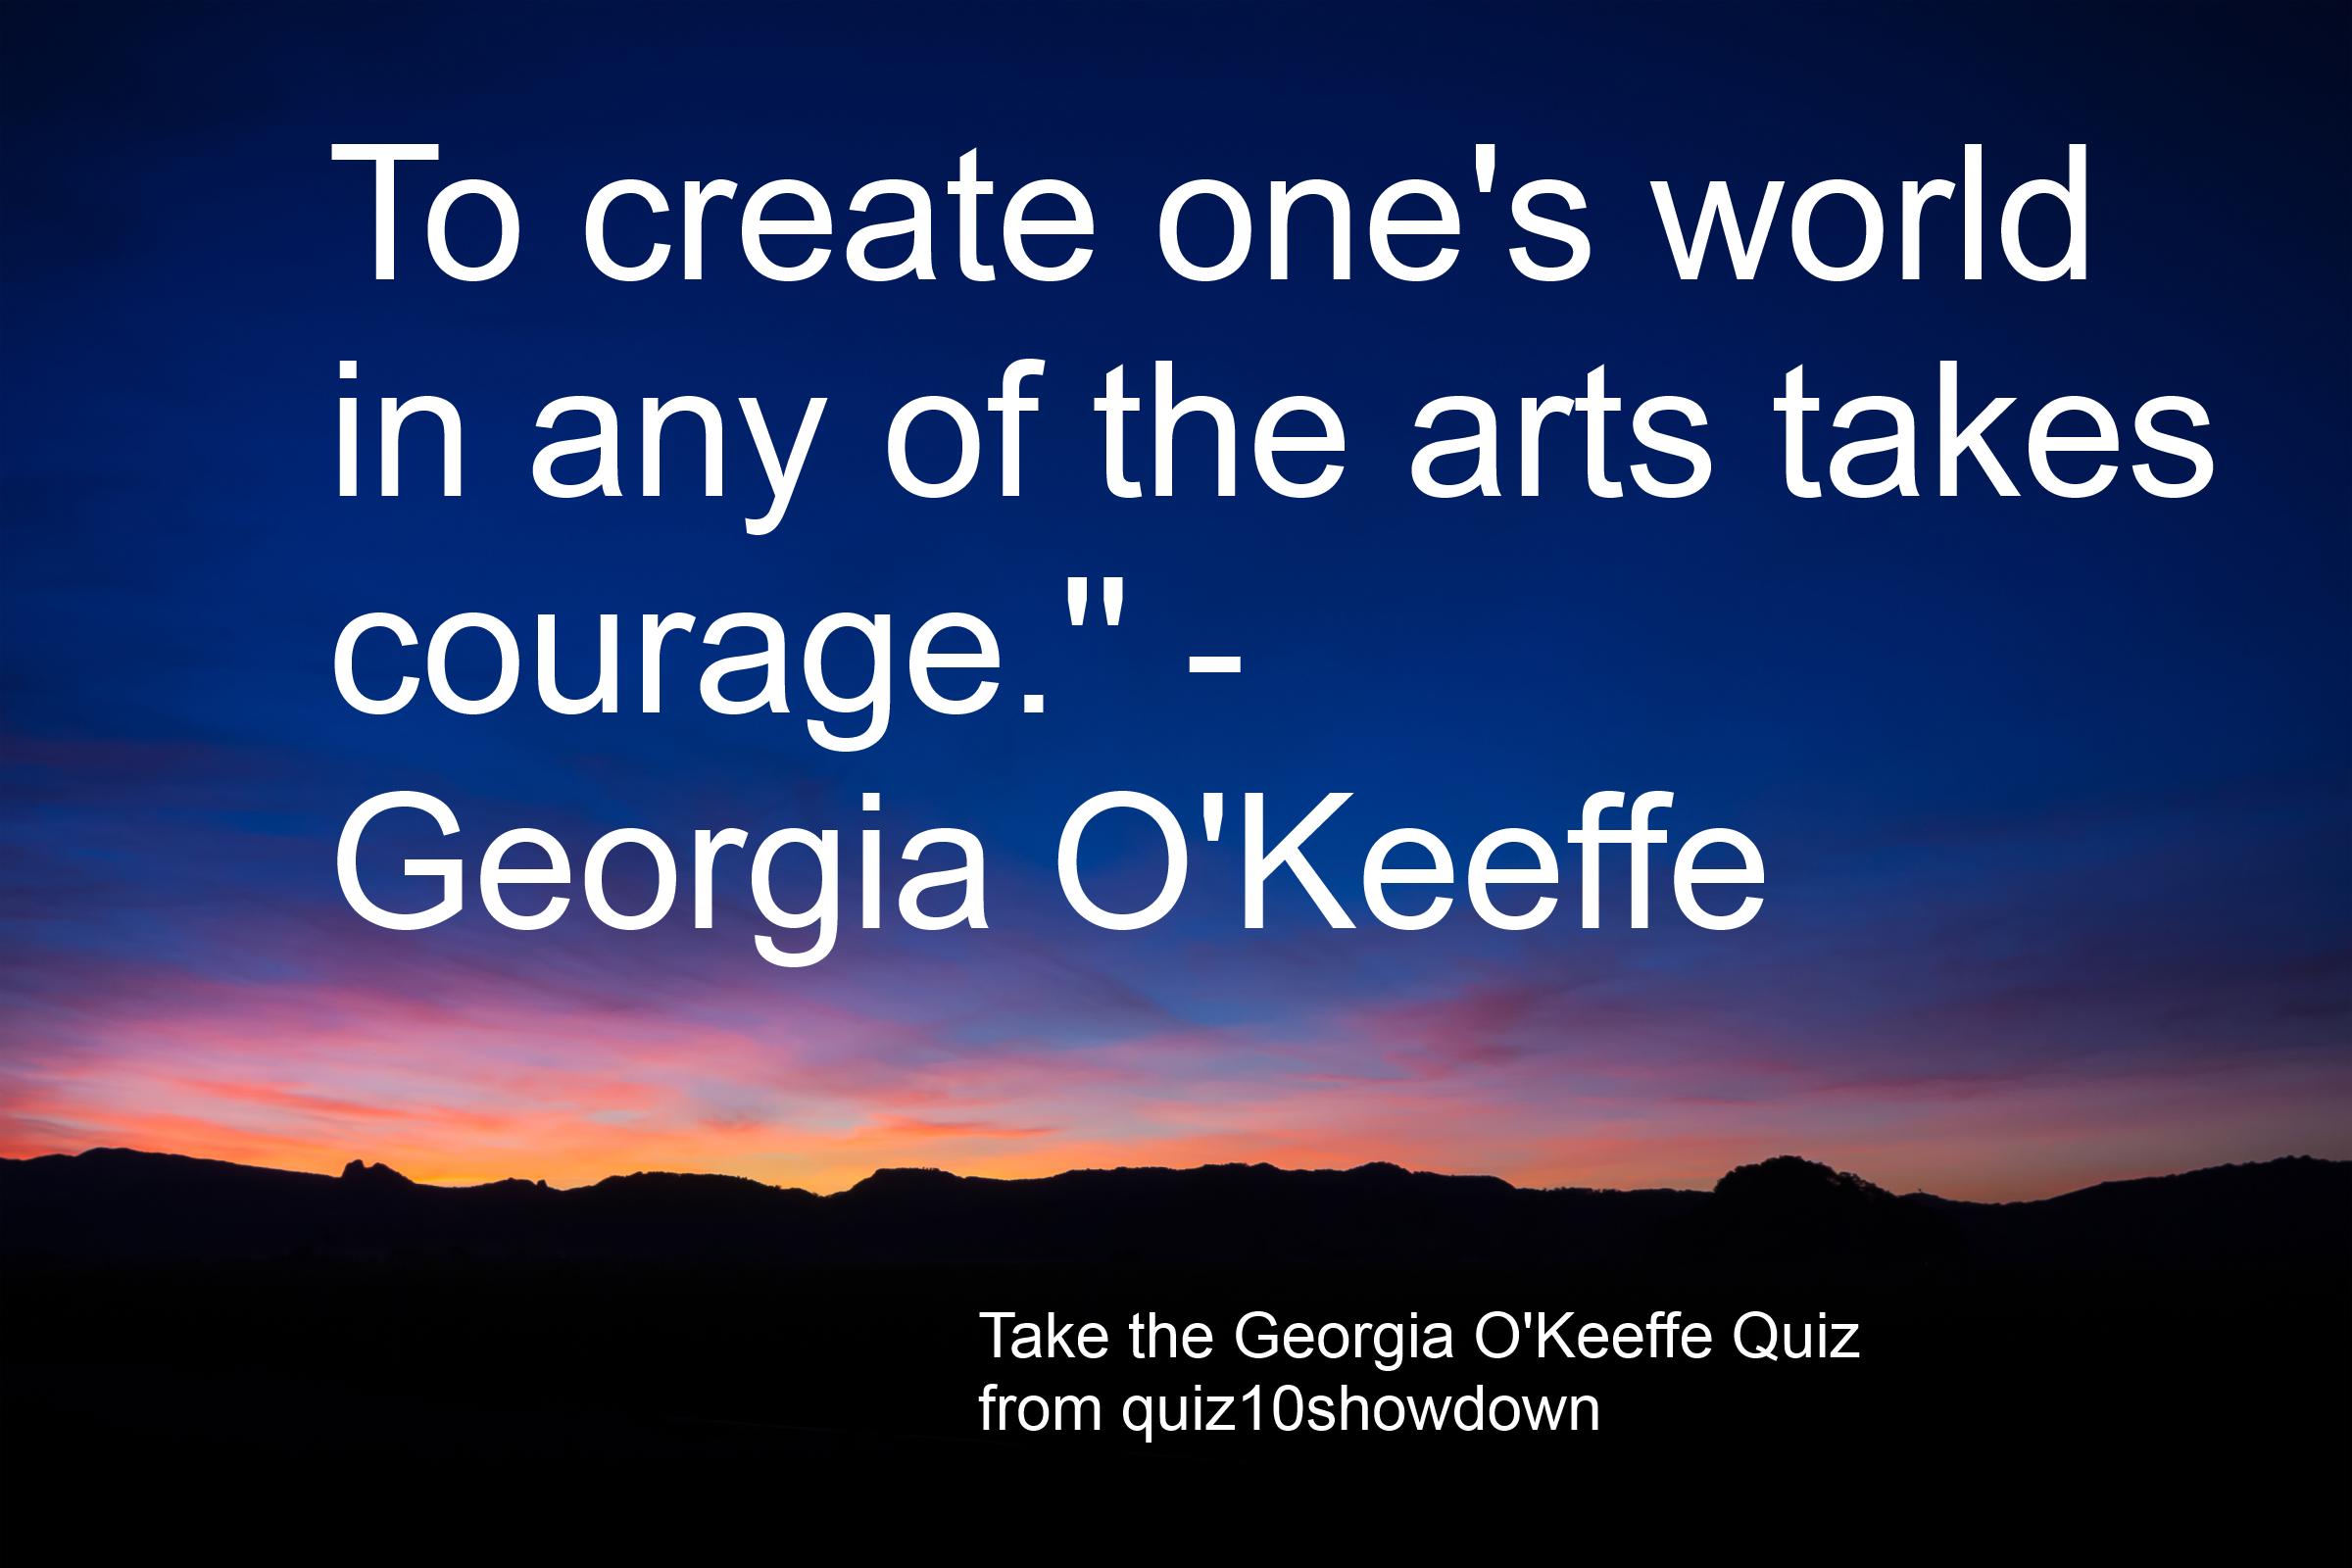 Try The Georgia O Keeffe Trivia Quiz From Quiz 10 Showdown